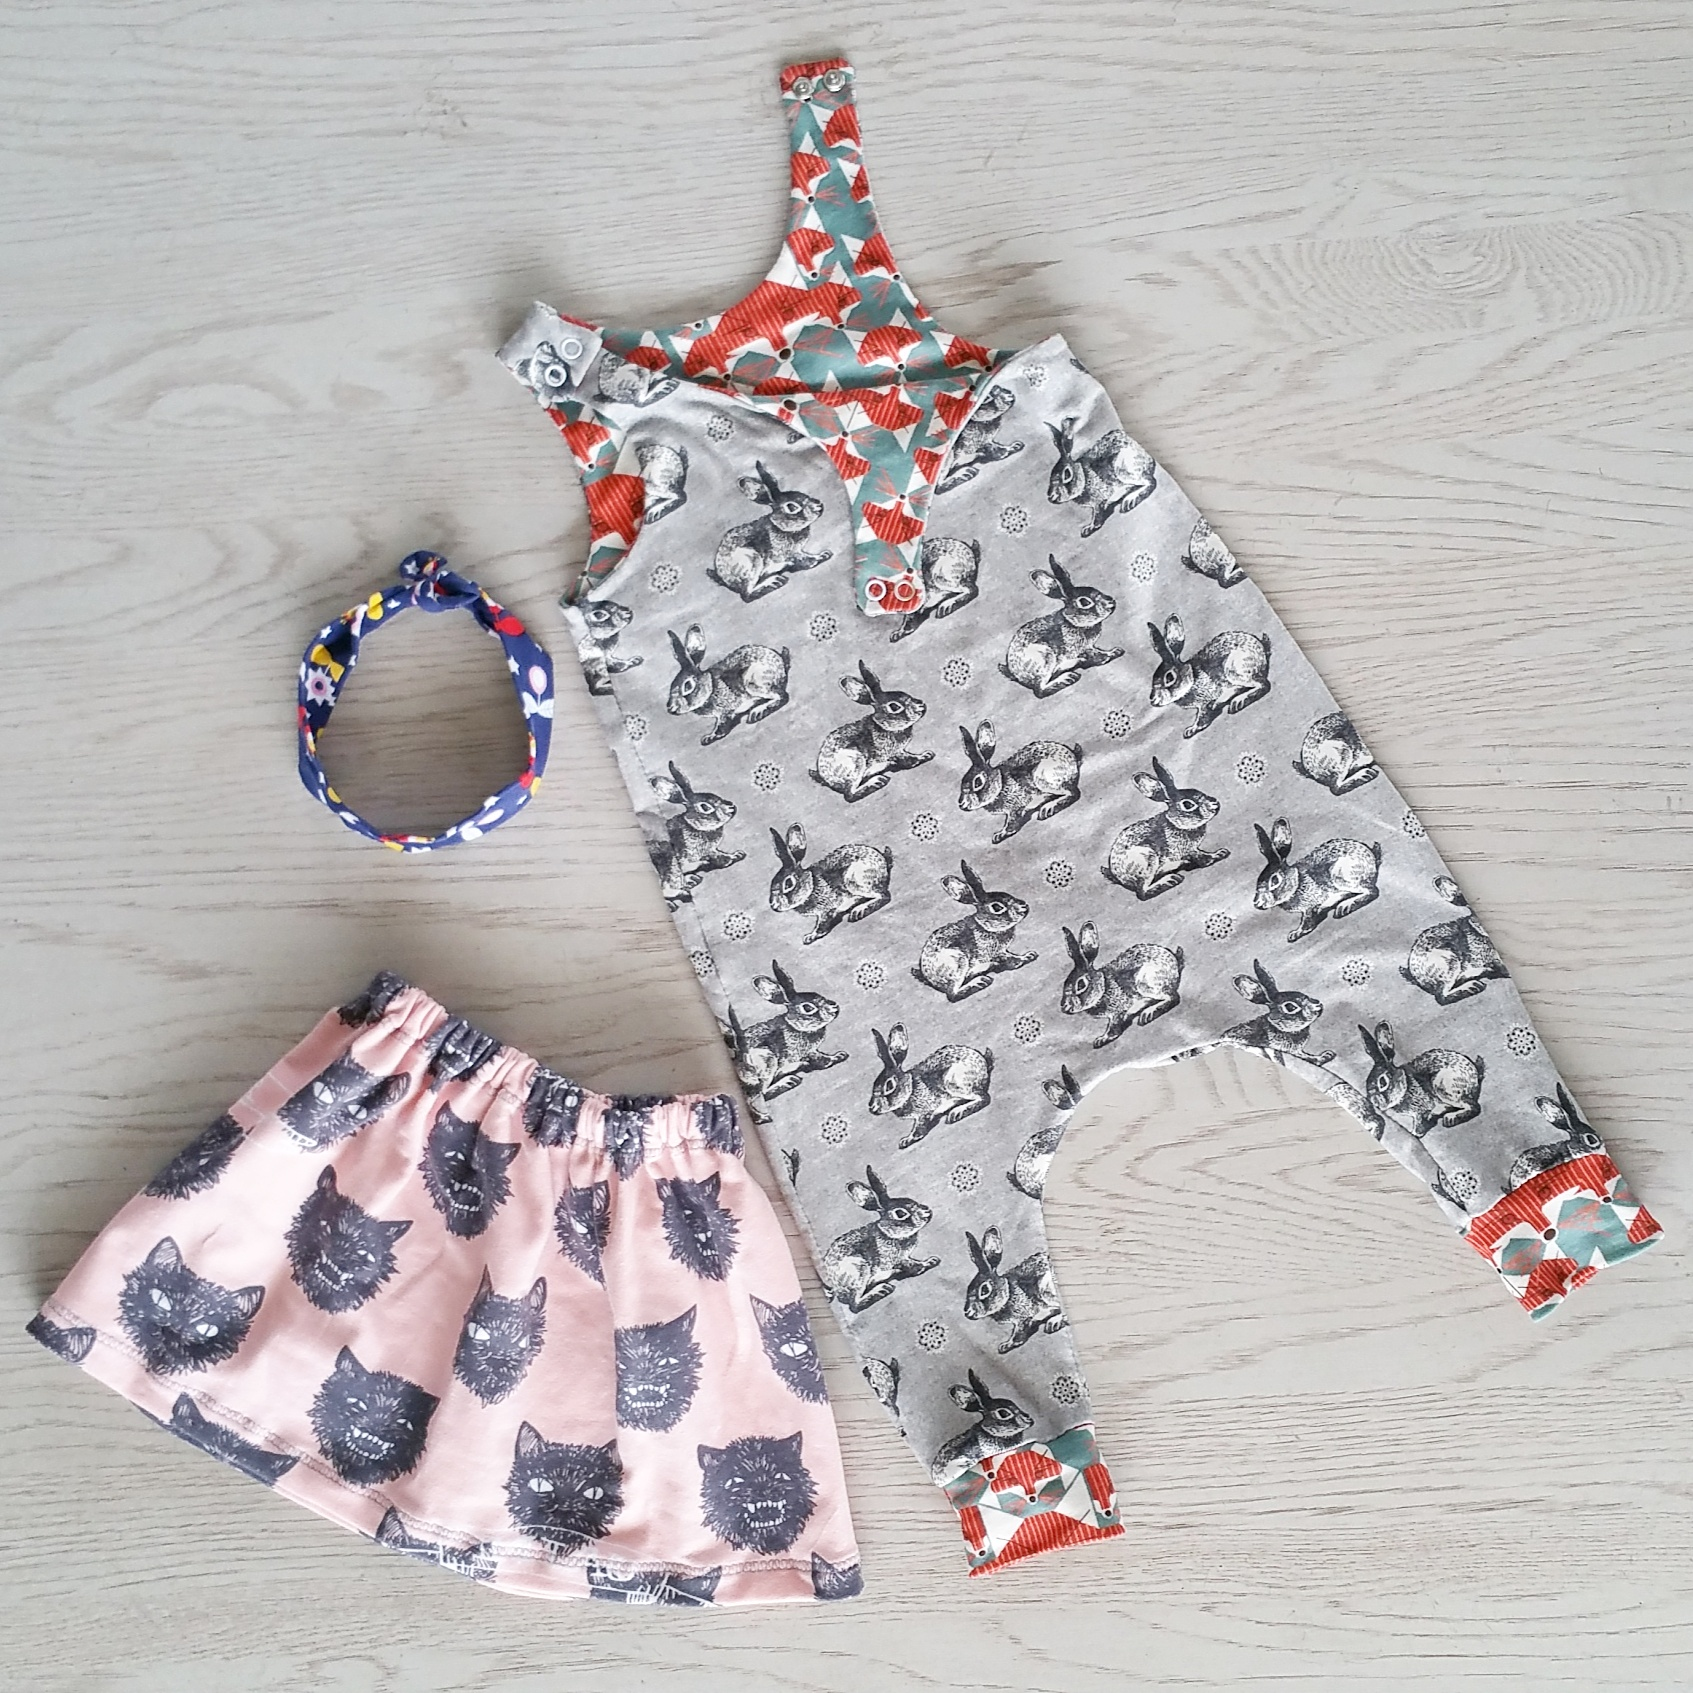 Rain Melody Saskatoon local handmade baby clothes